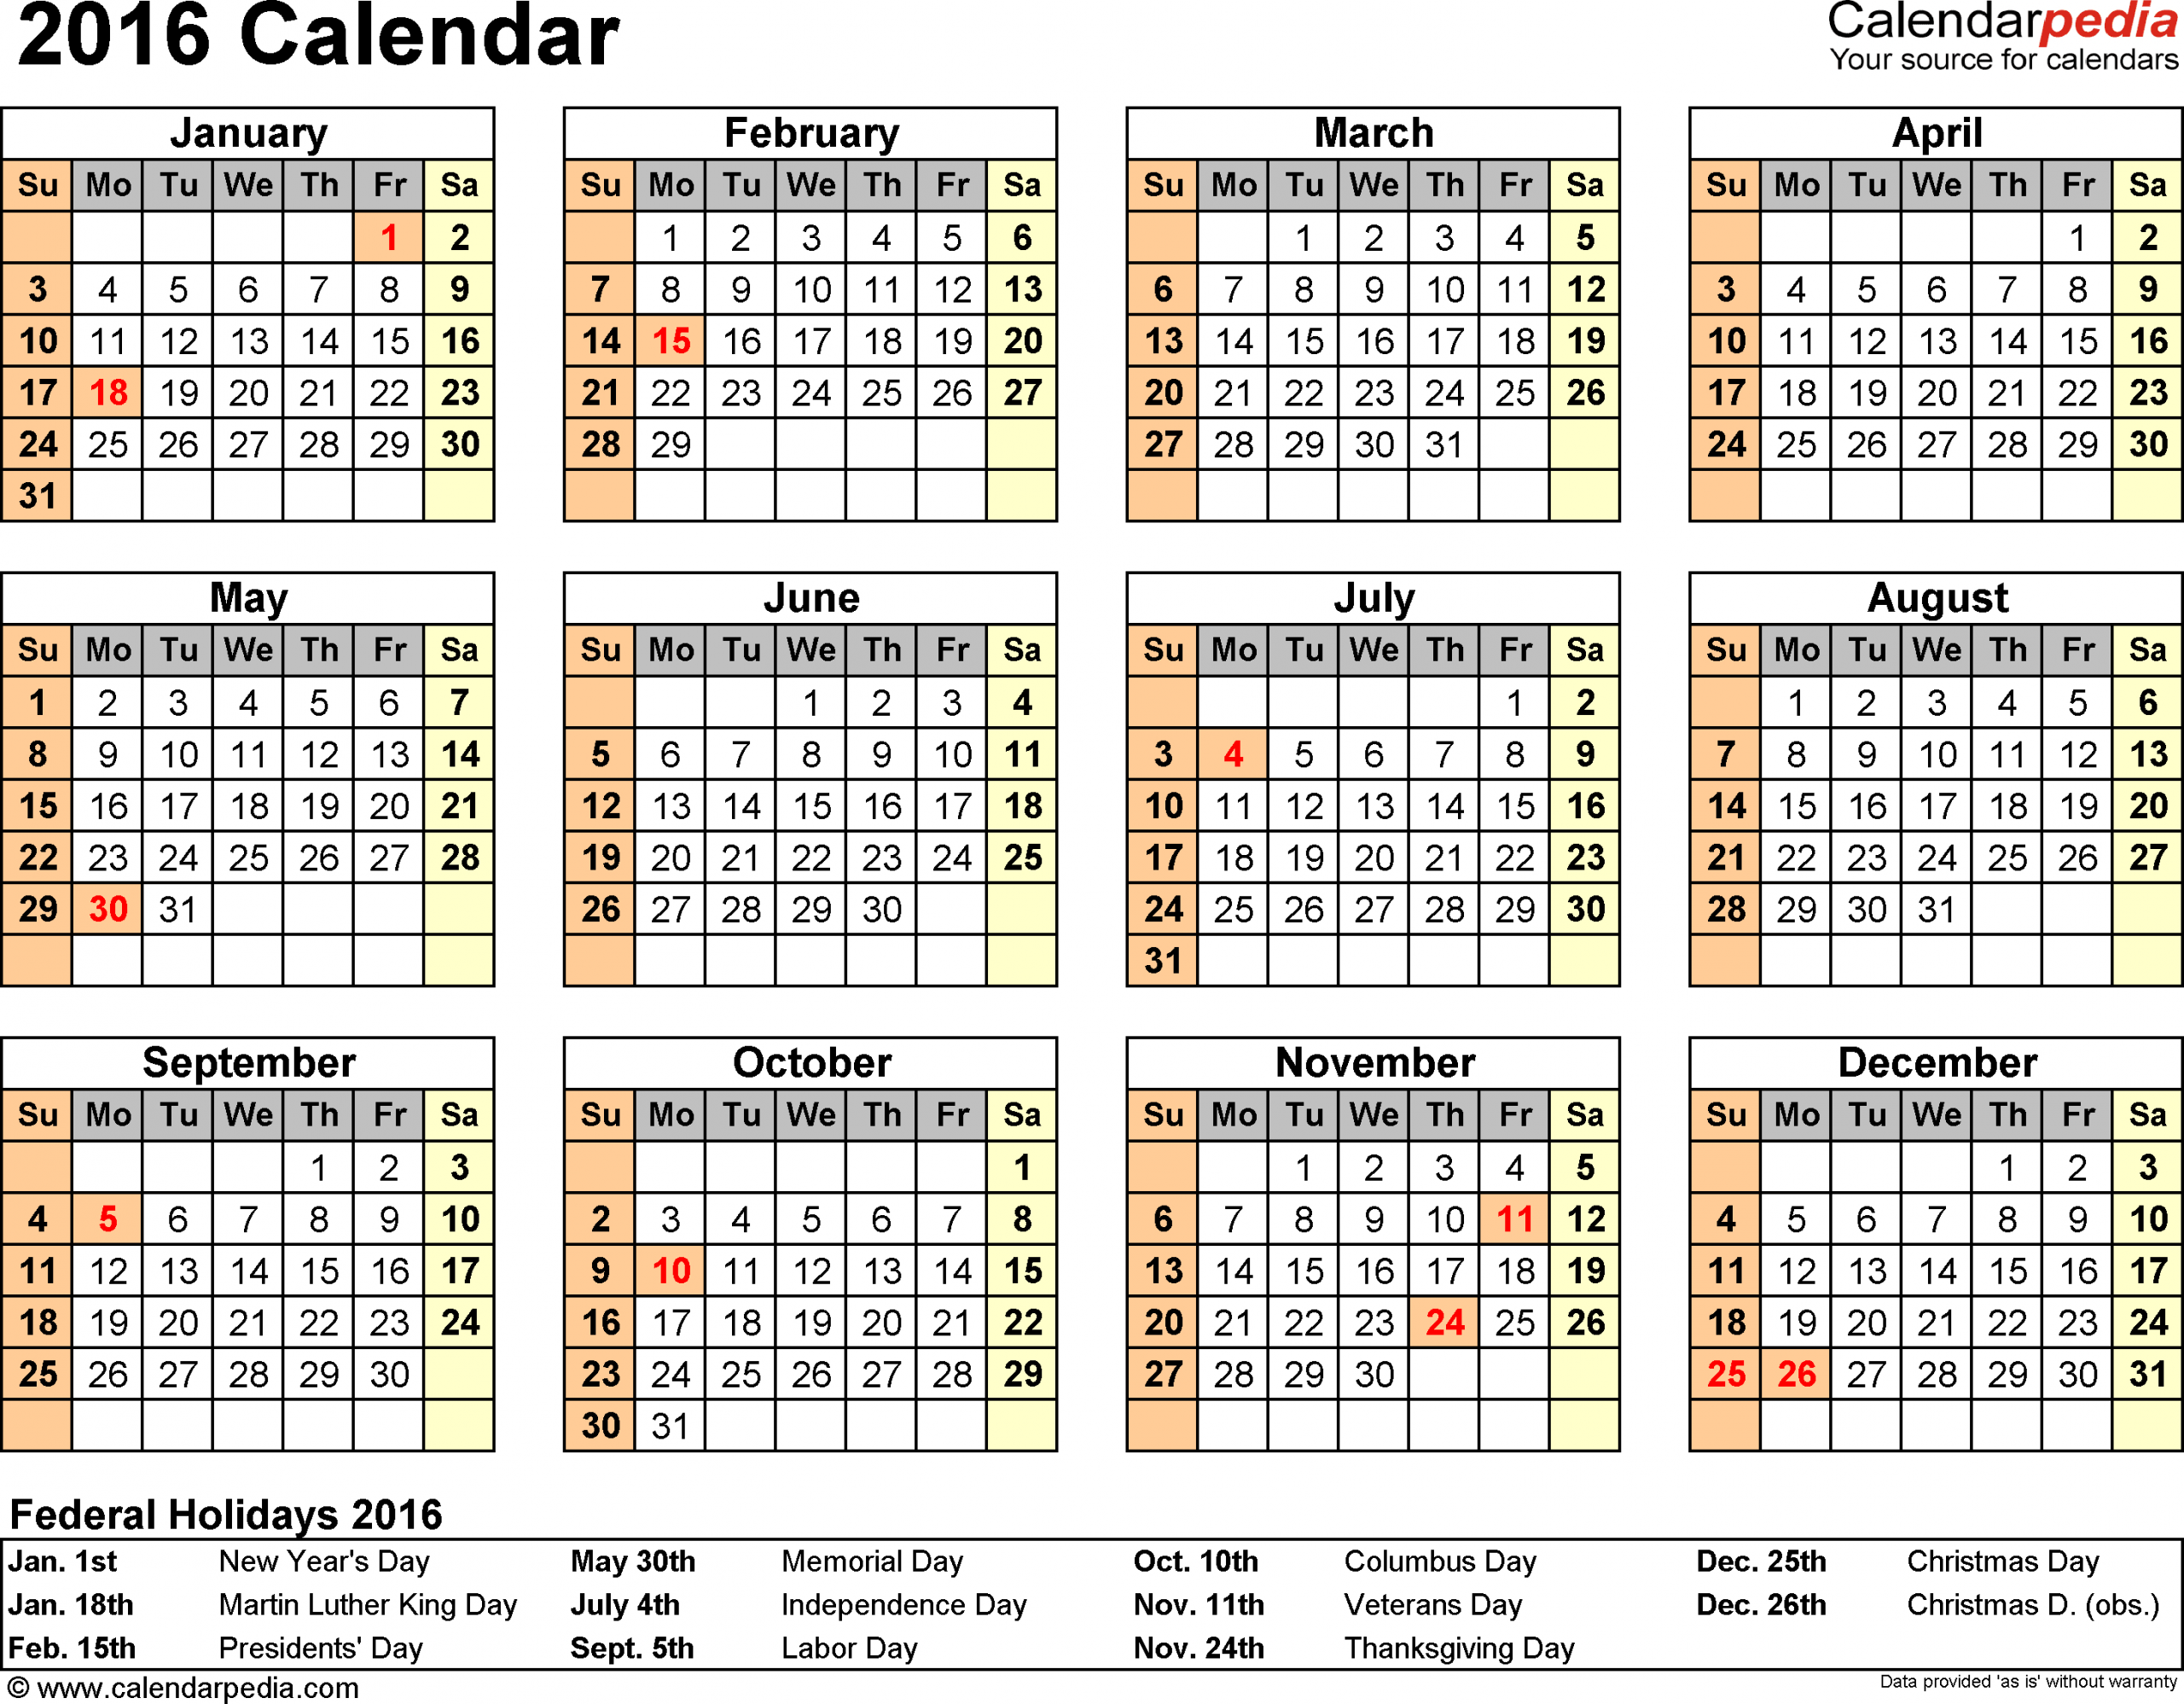 004 Calendar Template Ideas Shocking Printable 2016 Free